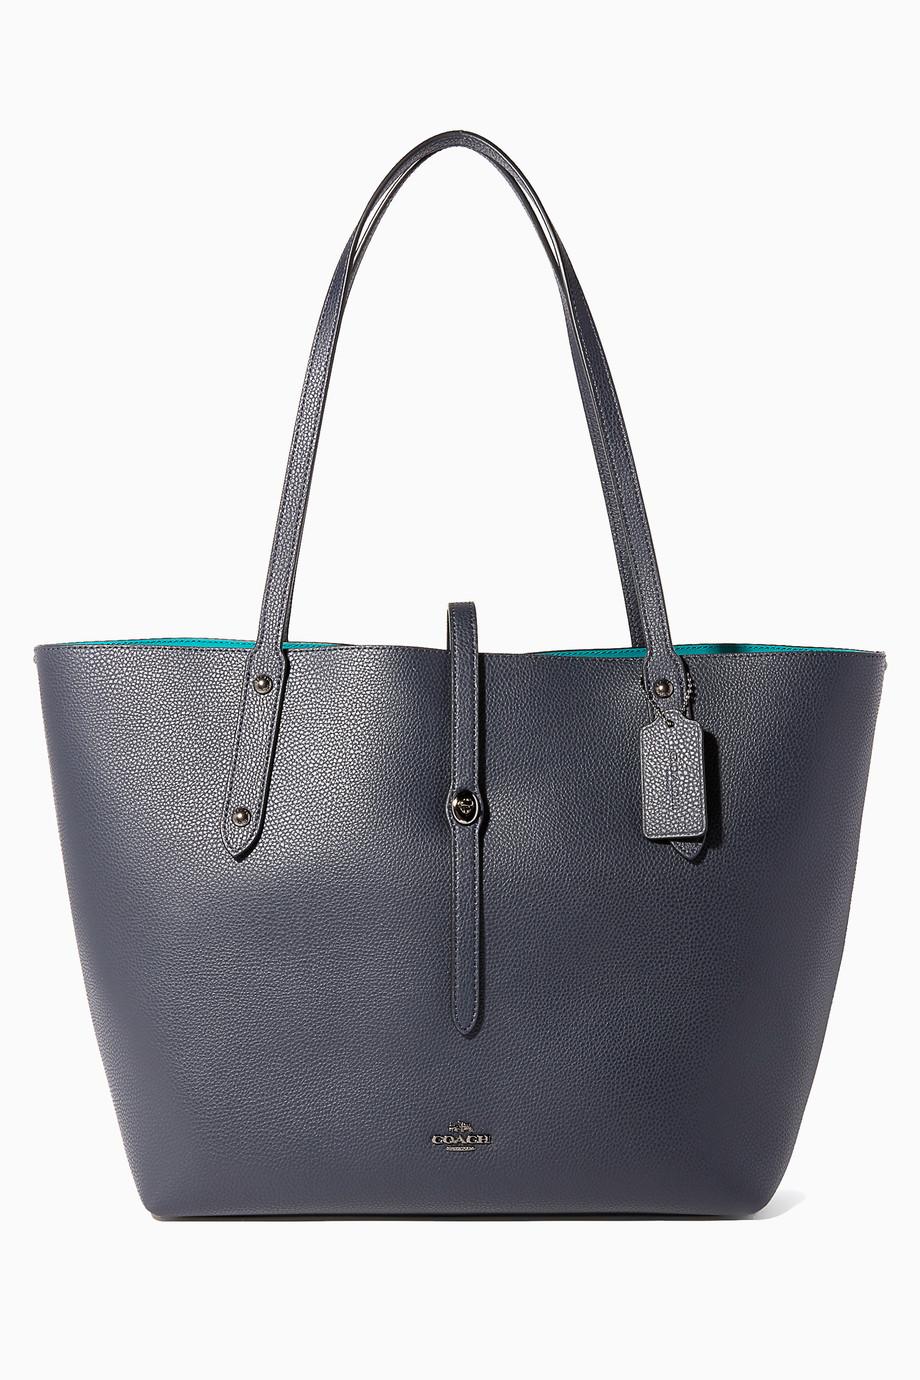 Shop Coach Blue Dark-Blue Market Tote for Women  27e7d842caa30